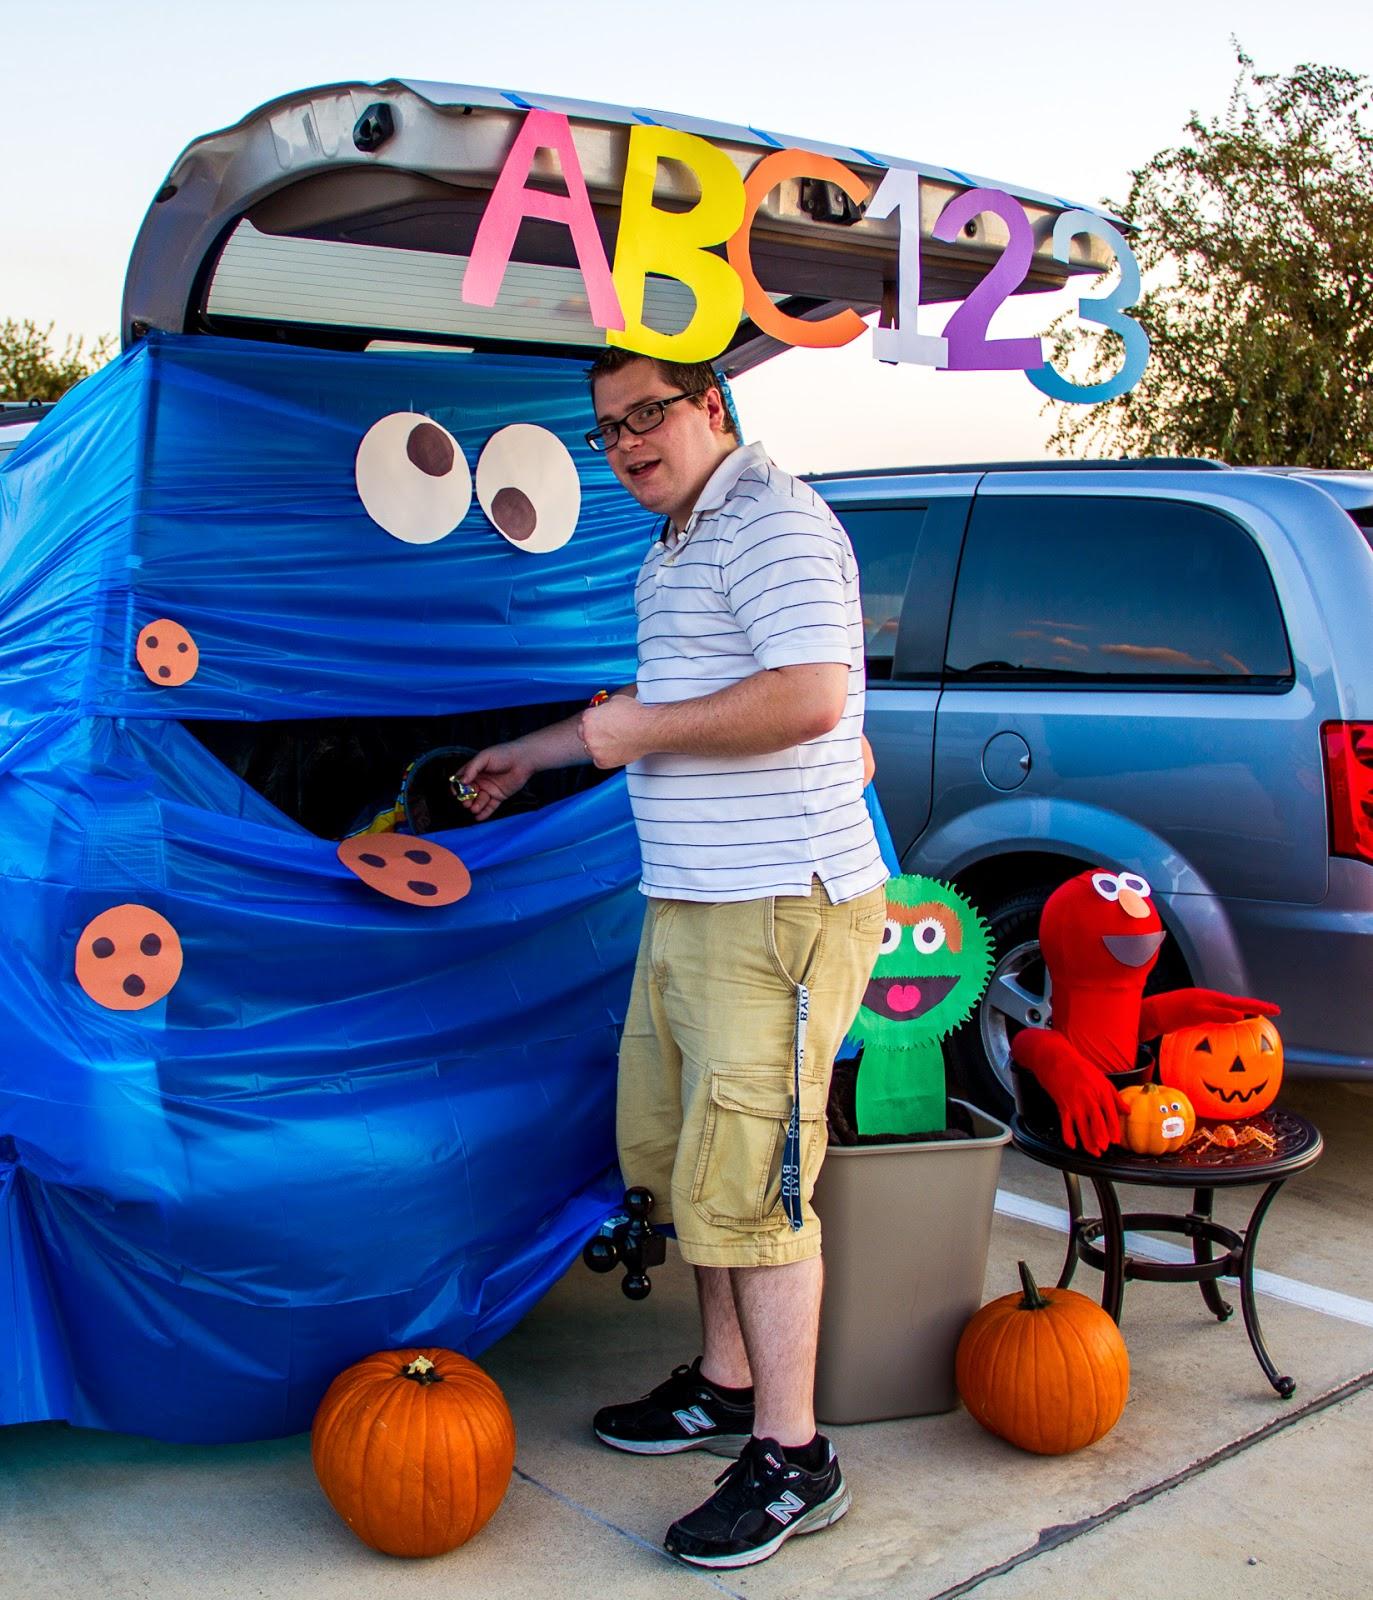 Trunk Halloween Decorating Ideas: Baldwins: A To Z: Trunk Or Treat